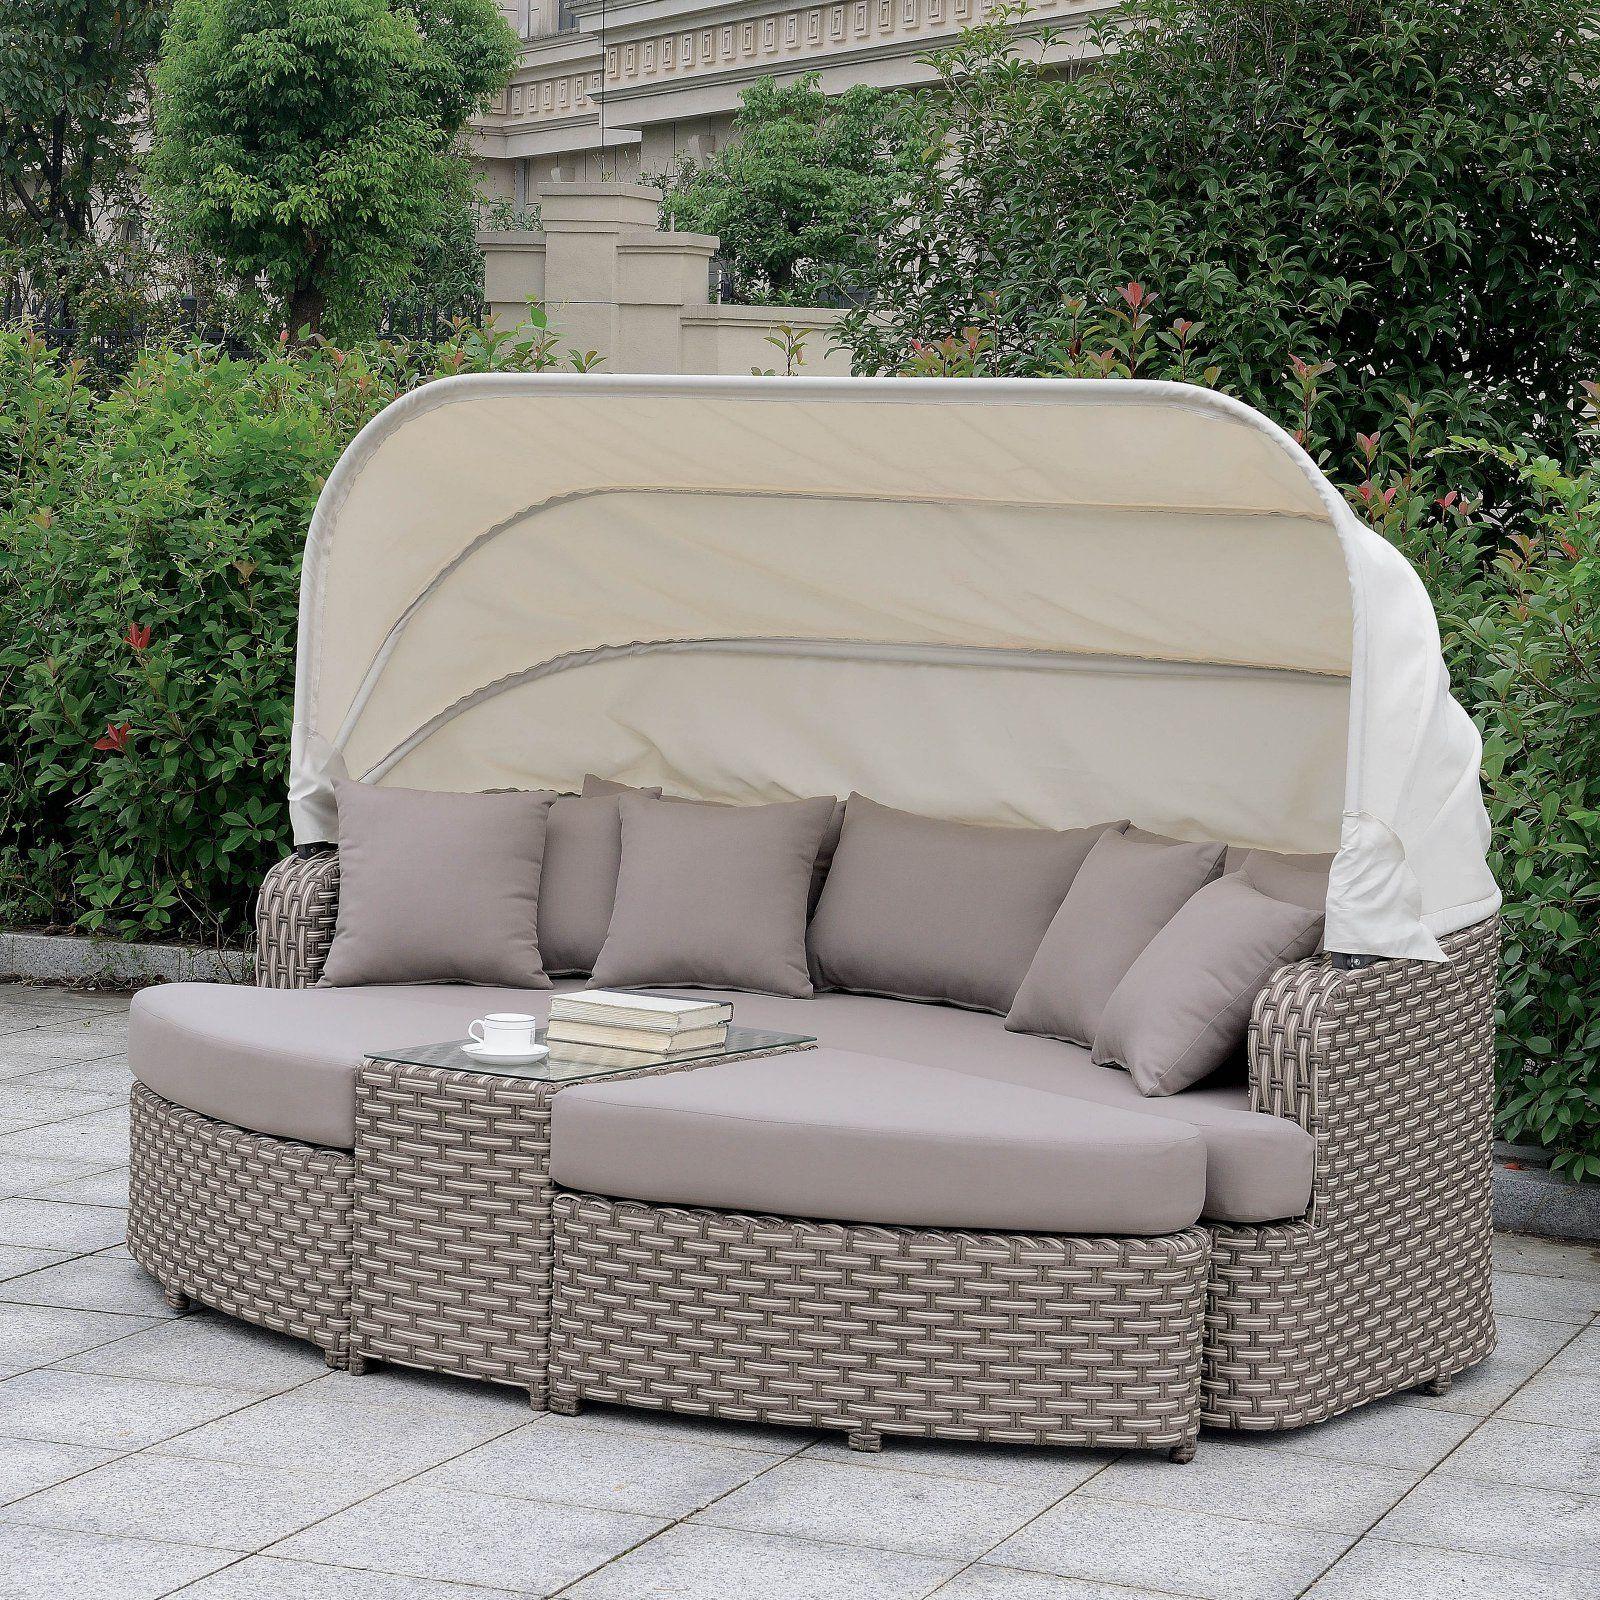 Furniture Of America Calabasas Resin Wicker Outdoor Patio 400 x 300